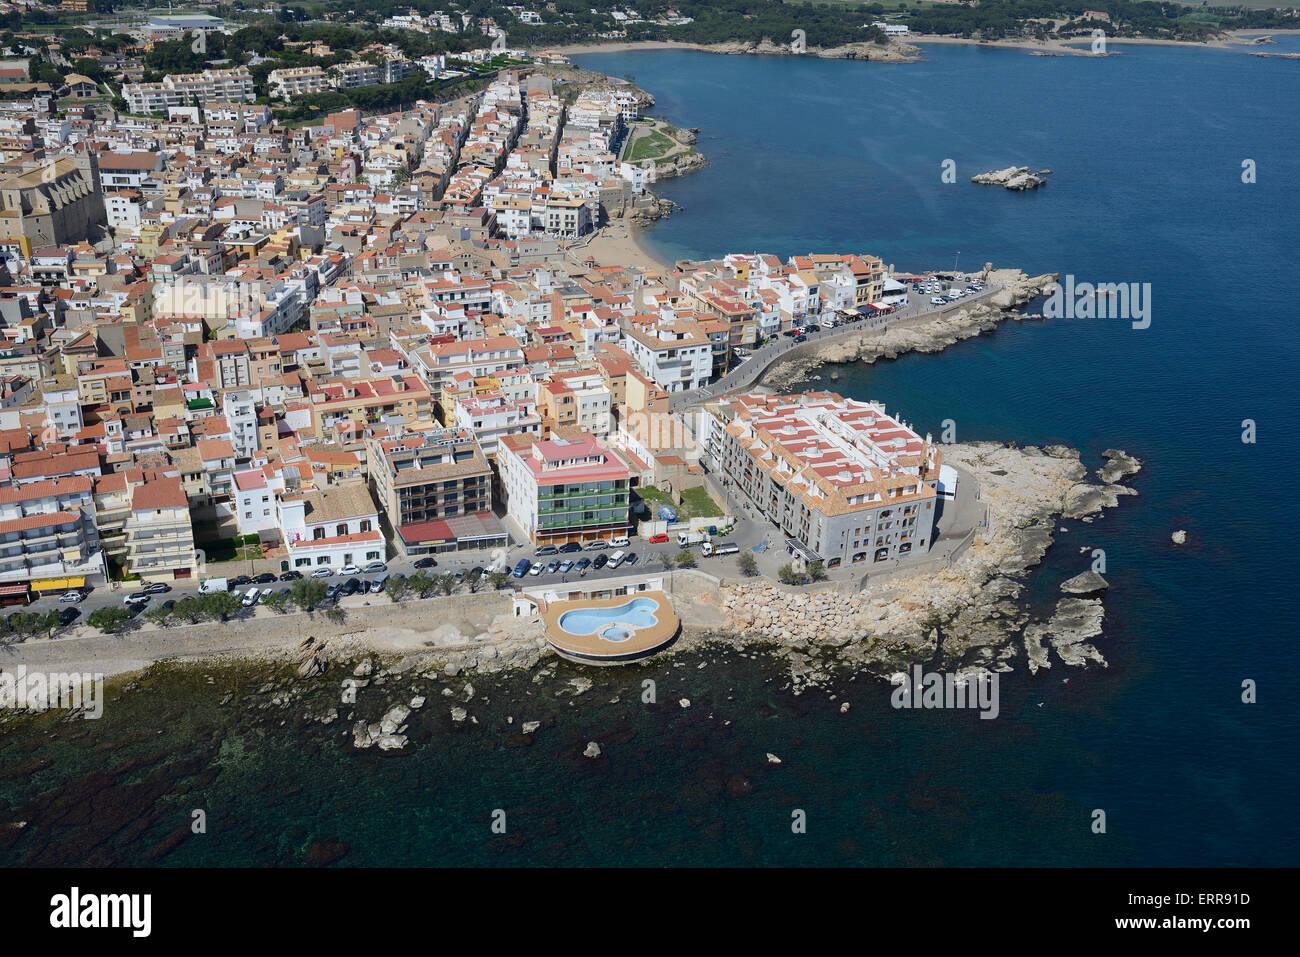 SEASIDE RESORT OF L'ESCALA (aerial view). Costa Brava, Catalonia, Spain. - Stock Image